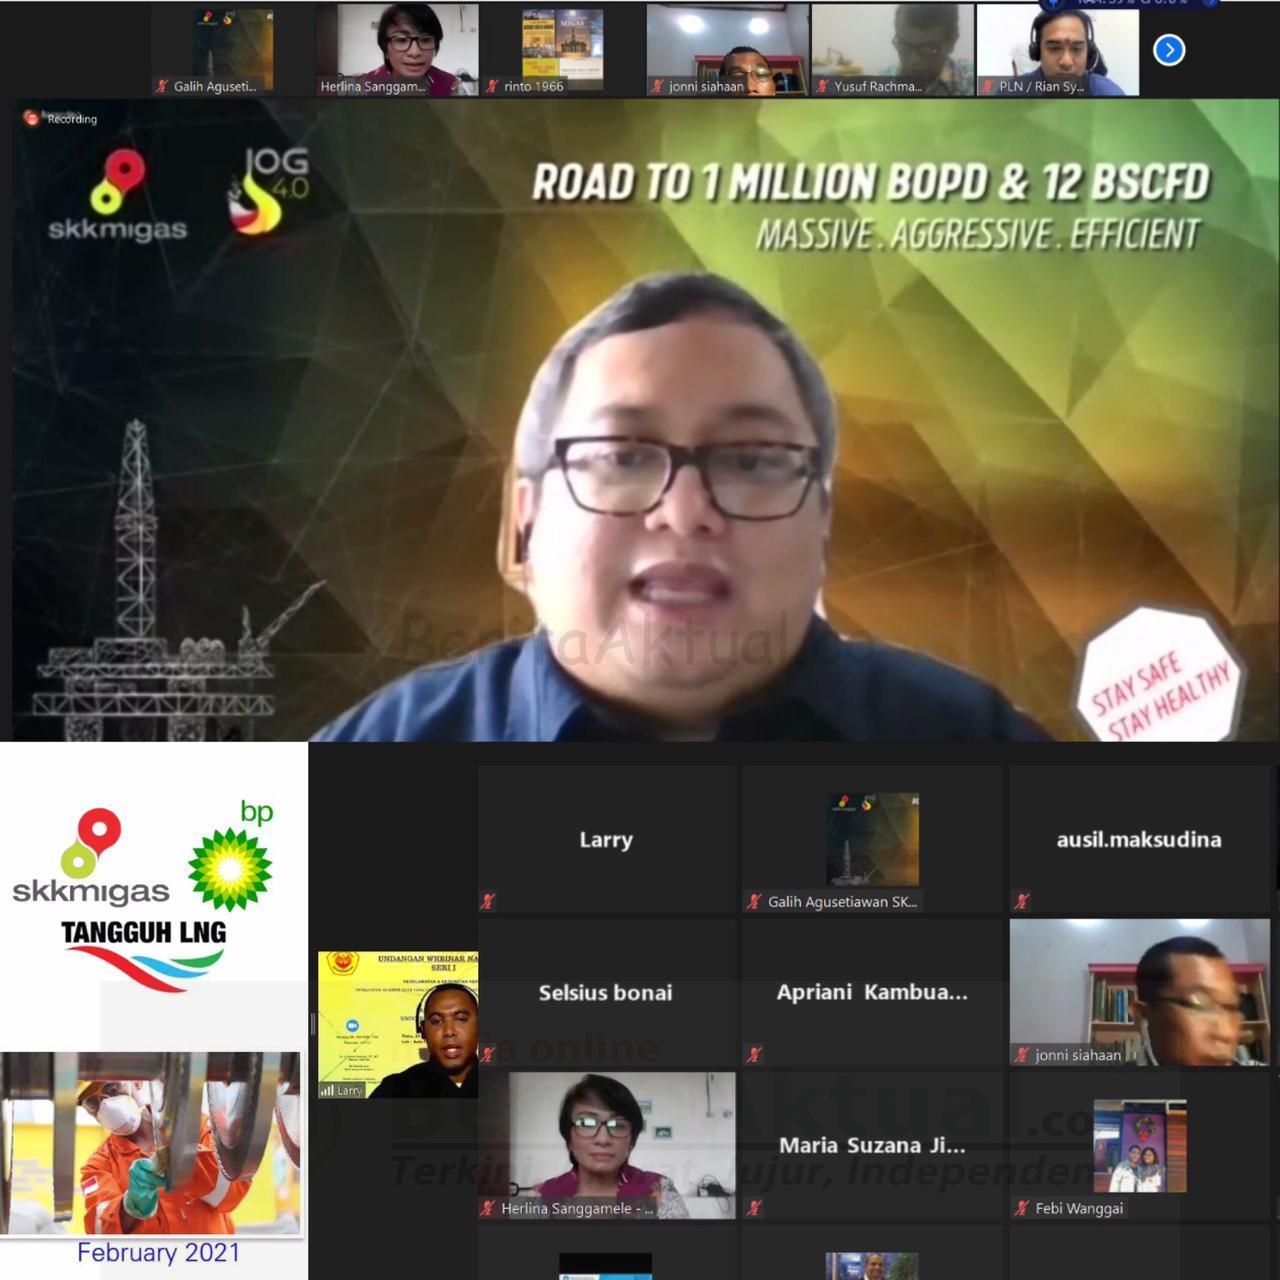 Industri Hulu Migas Wil Papua Maluku Dukung Pencanangan Bulan K3 Bersama Civitas Akademika Uncen 1 IMG 20210225 WA0001